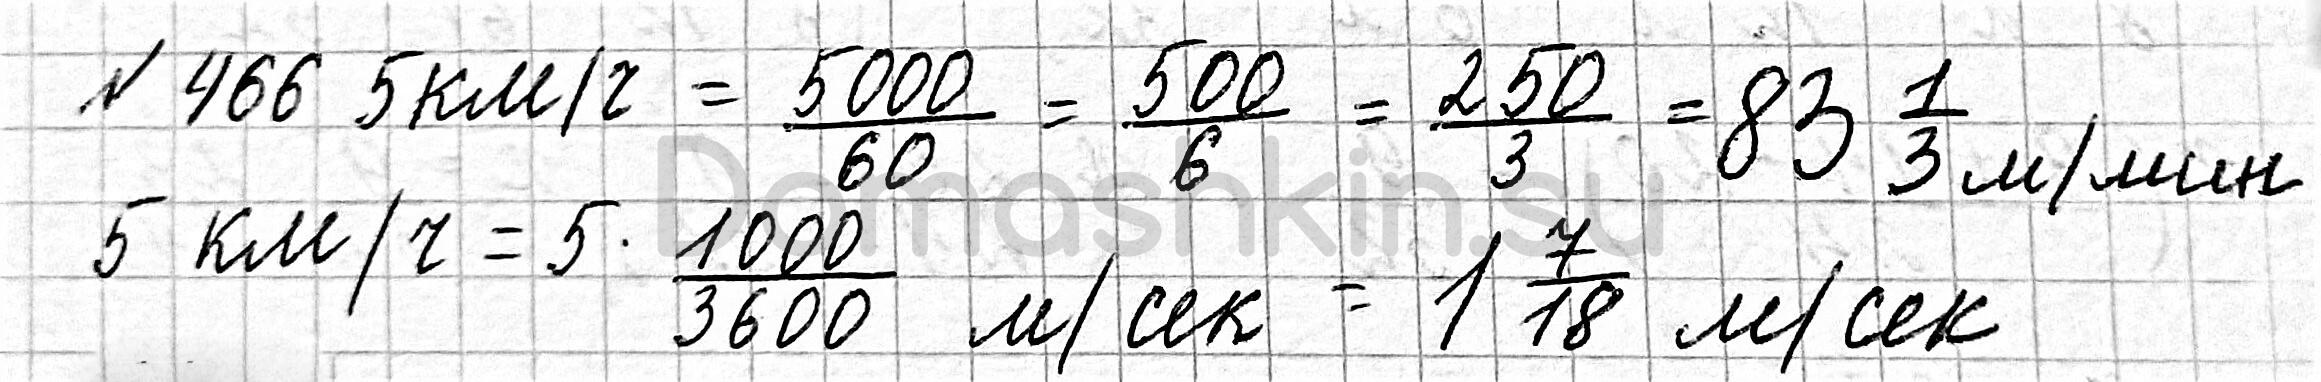 Математика 6 класс учебник Мерзляк номер 466 решение